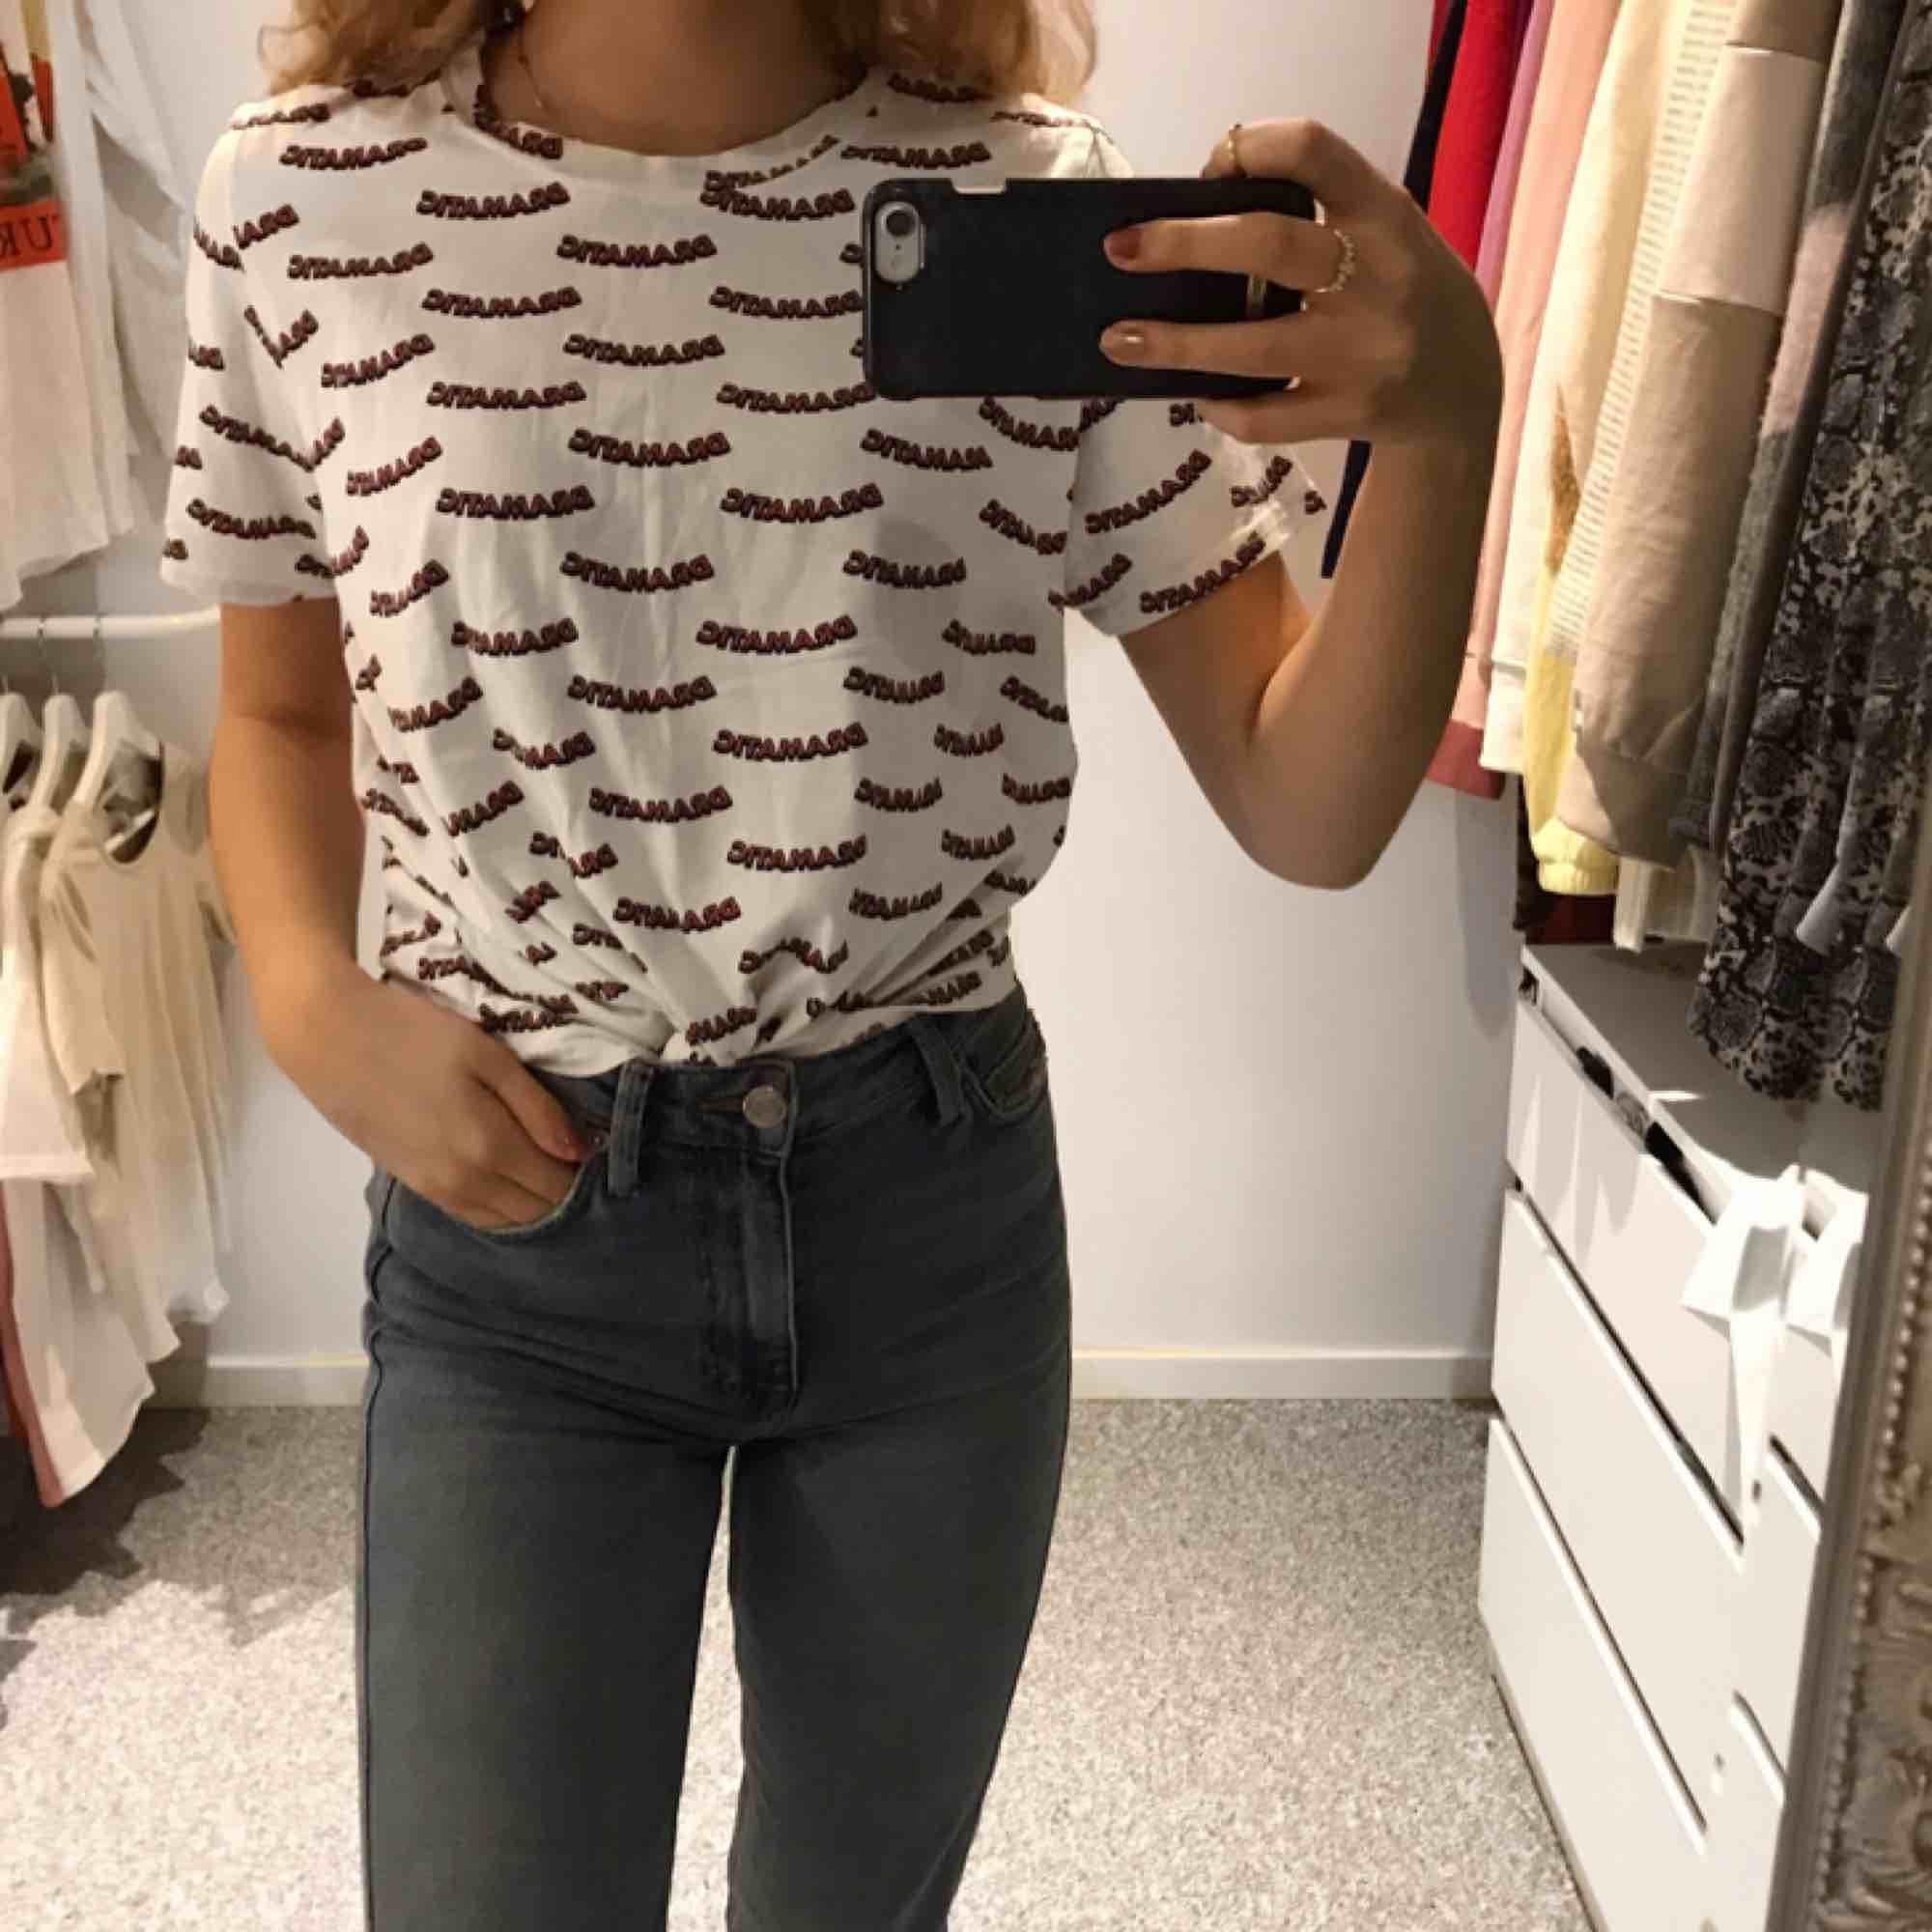 Vit T-shirt med tryck Storlek L men sitter snyggt på mig med xs! 🎀. T-shirts.